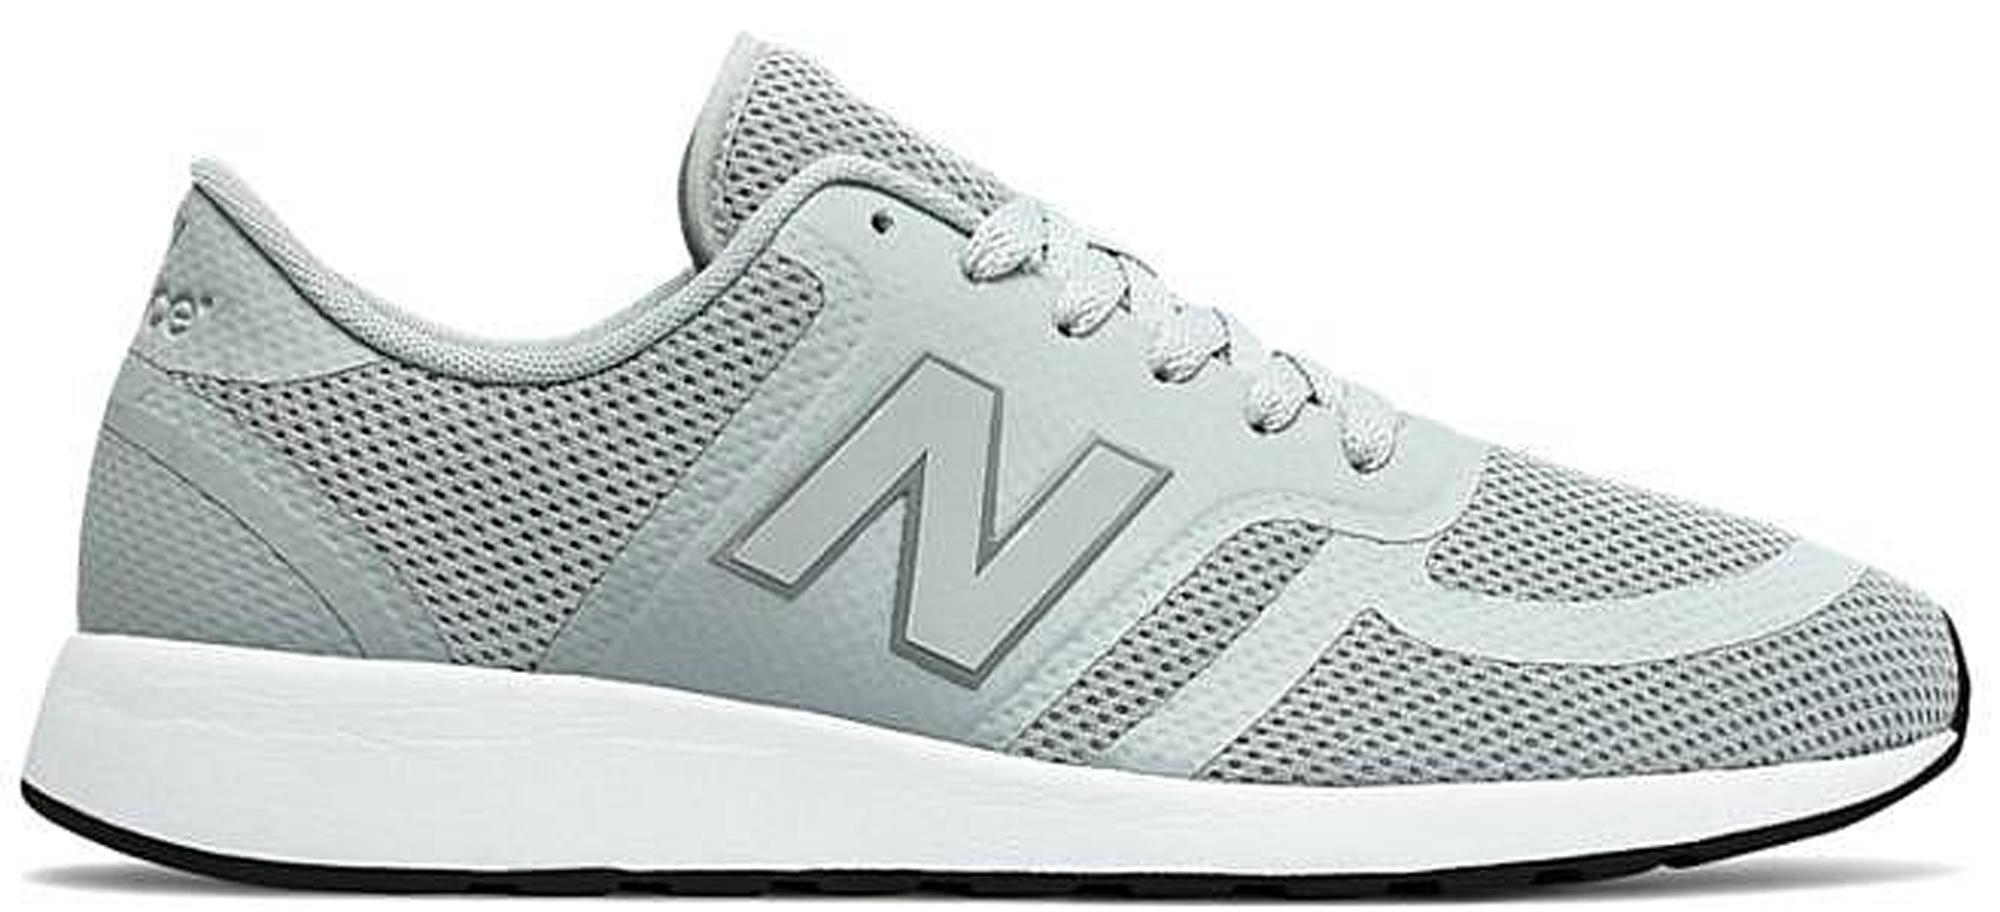 new balance 420 black and grey